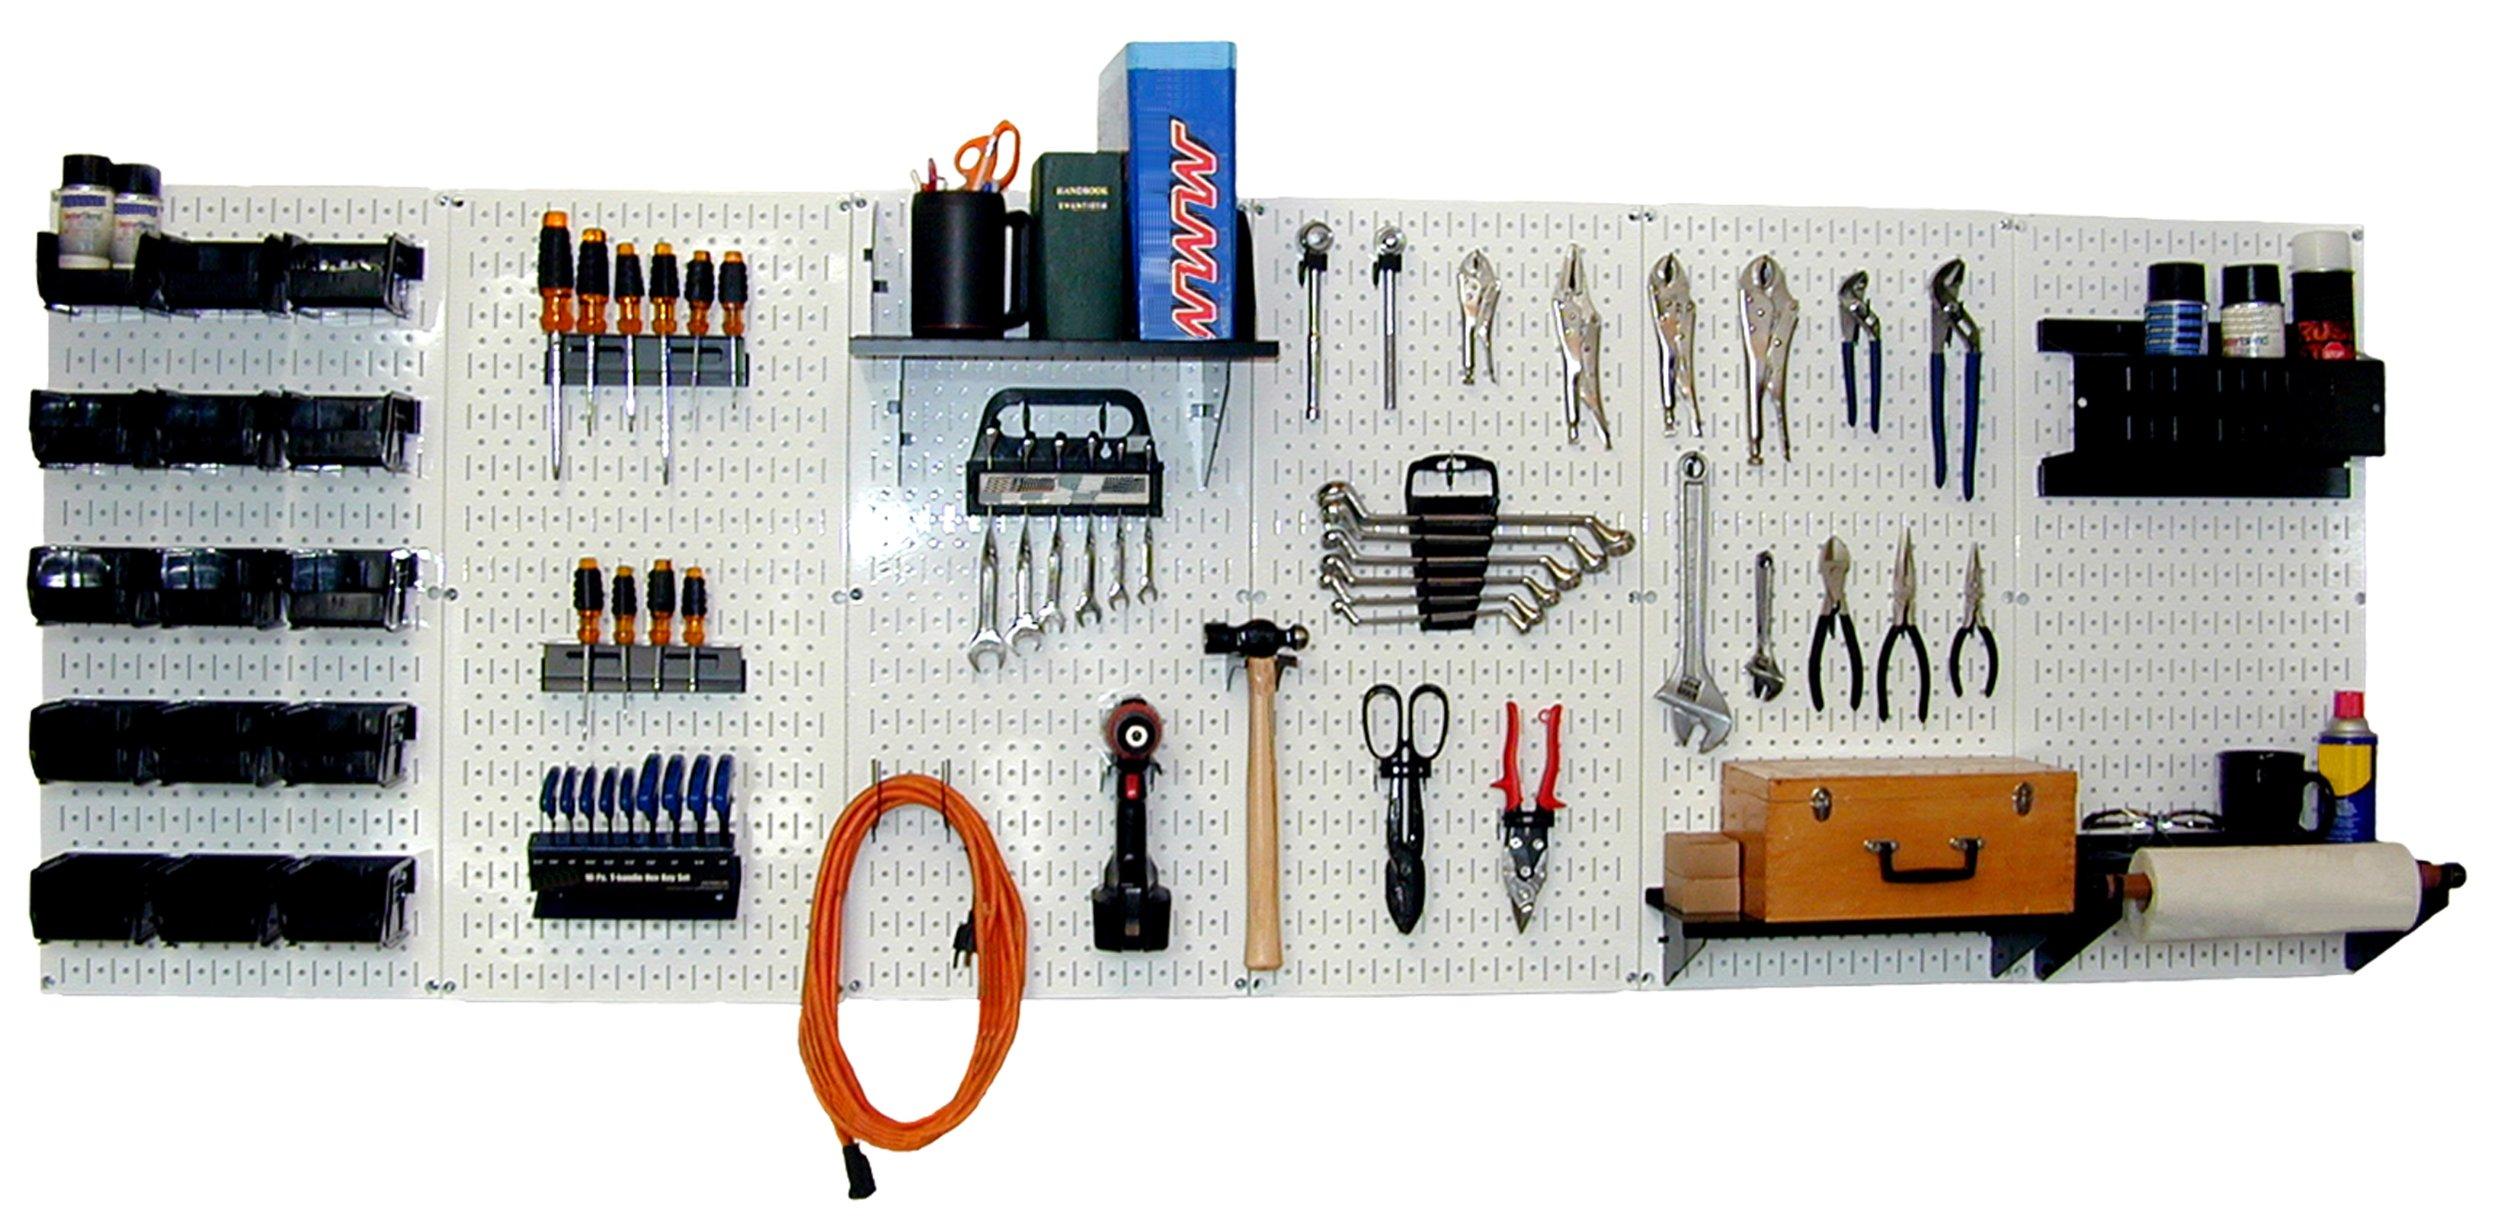 Wall Control 30-WRK-800WB Master Workbench Metal Pegboard Tool Organizer by Wall Control (Image #1)